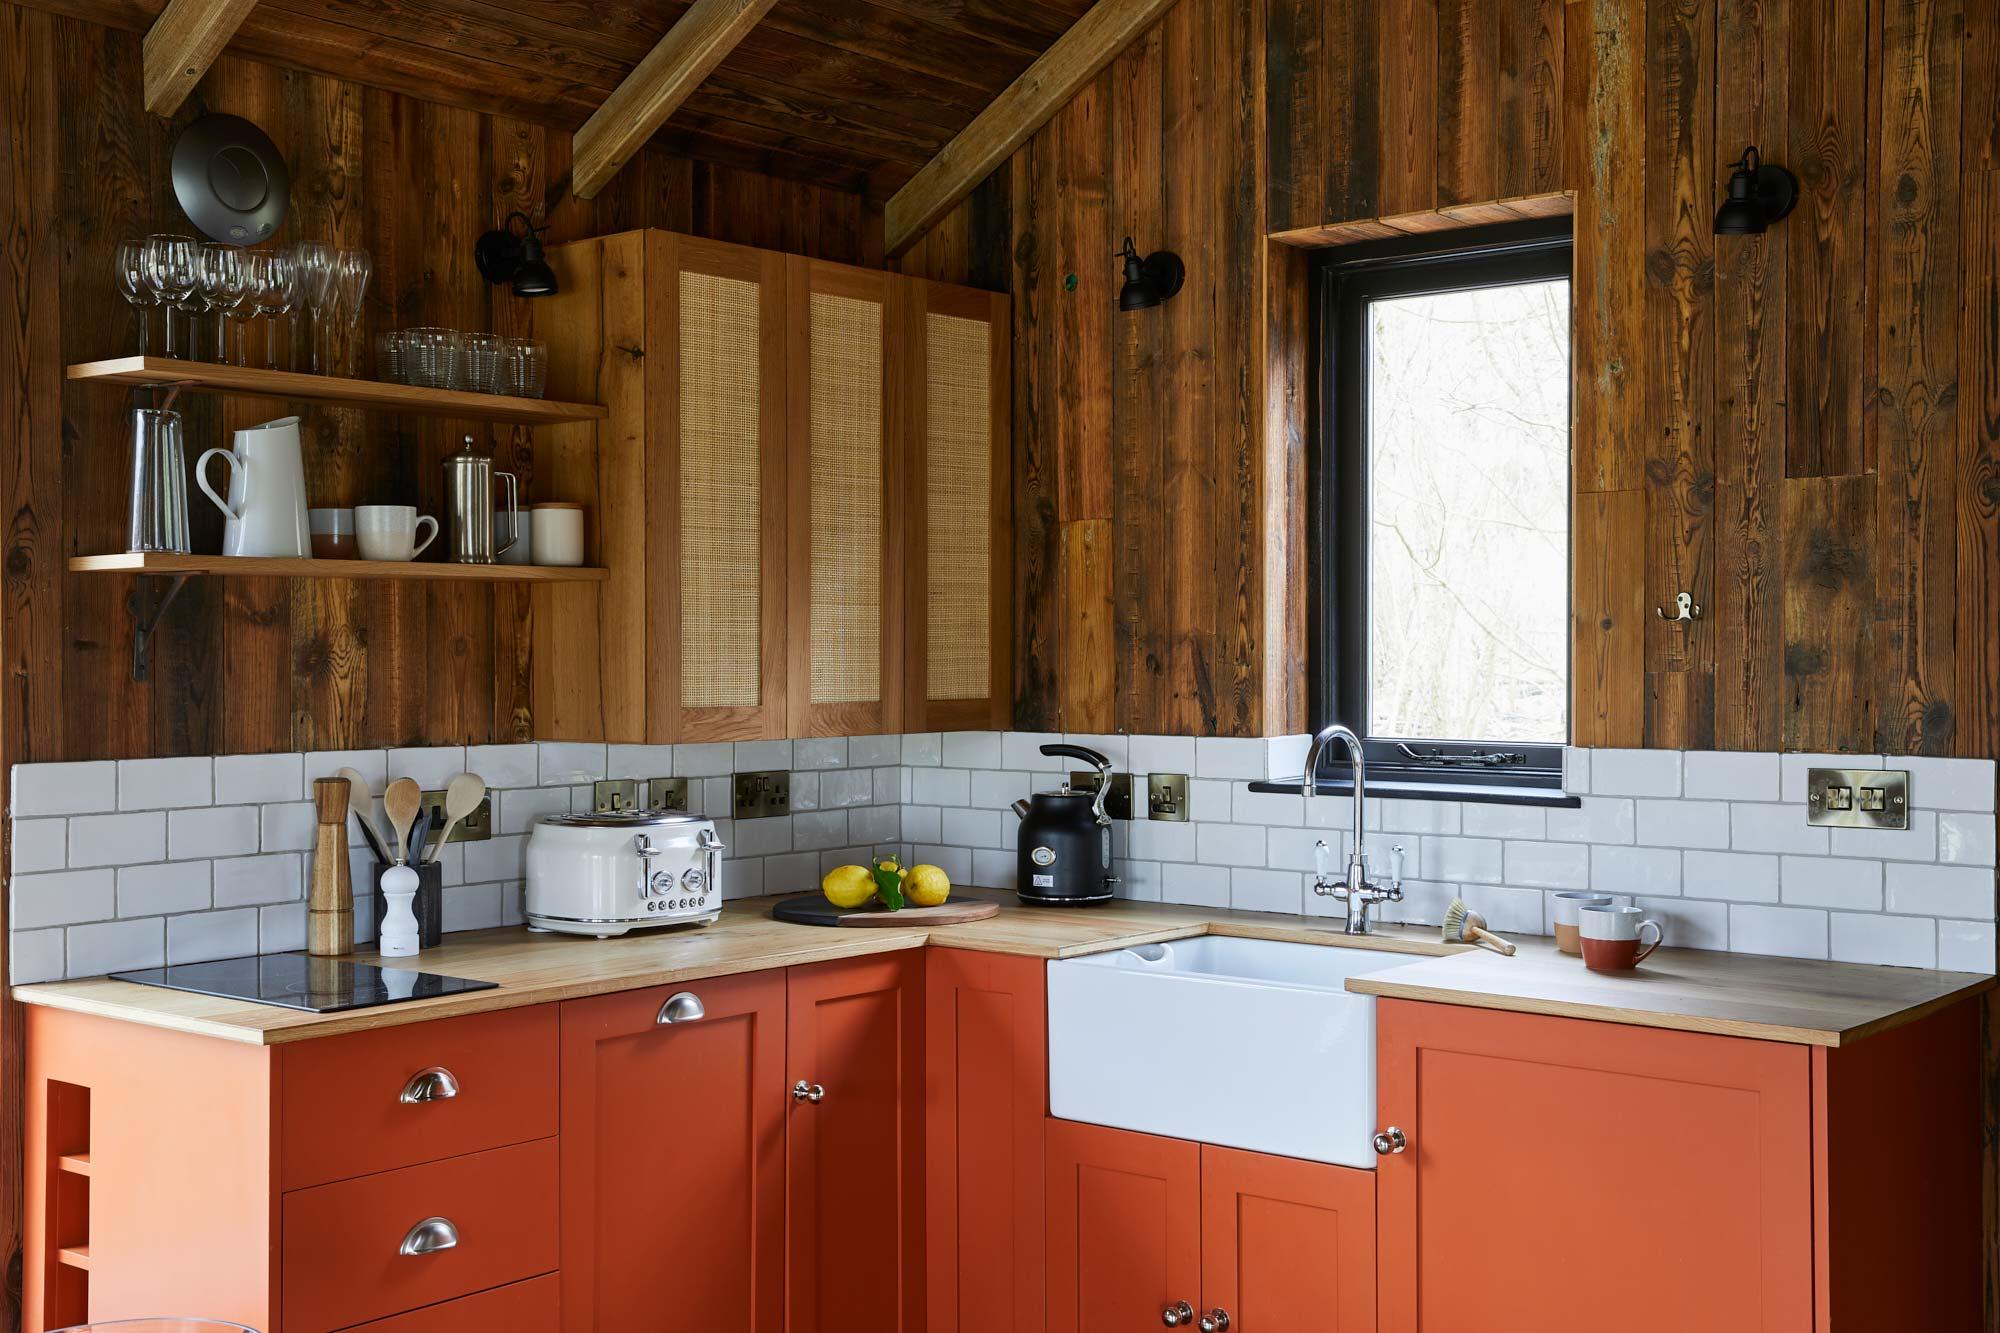 Bespoke orange kitchen in treehouse